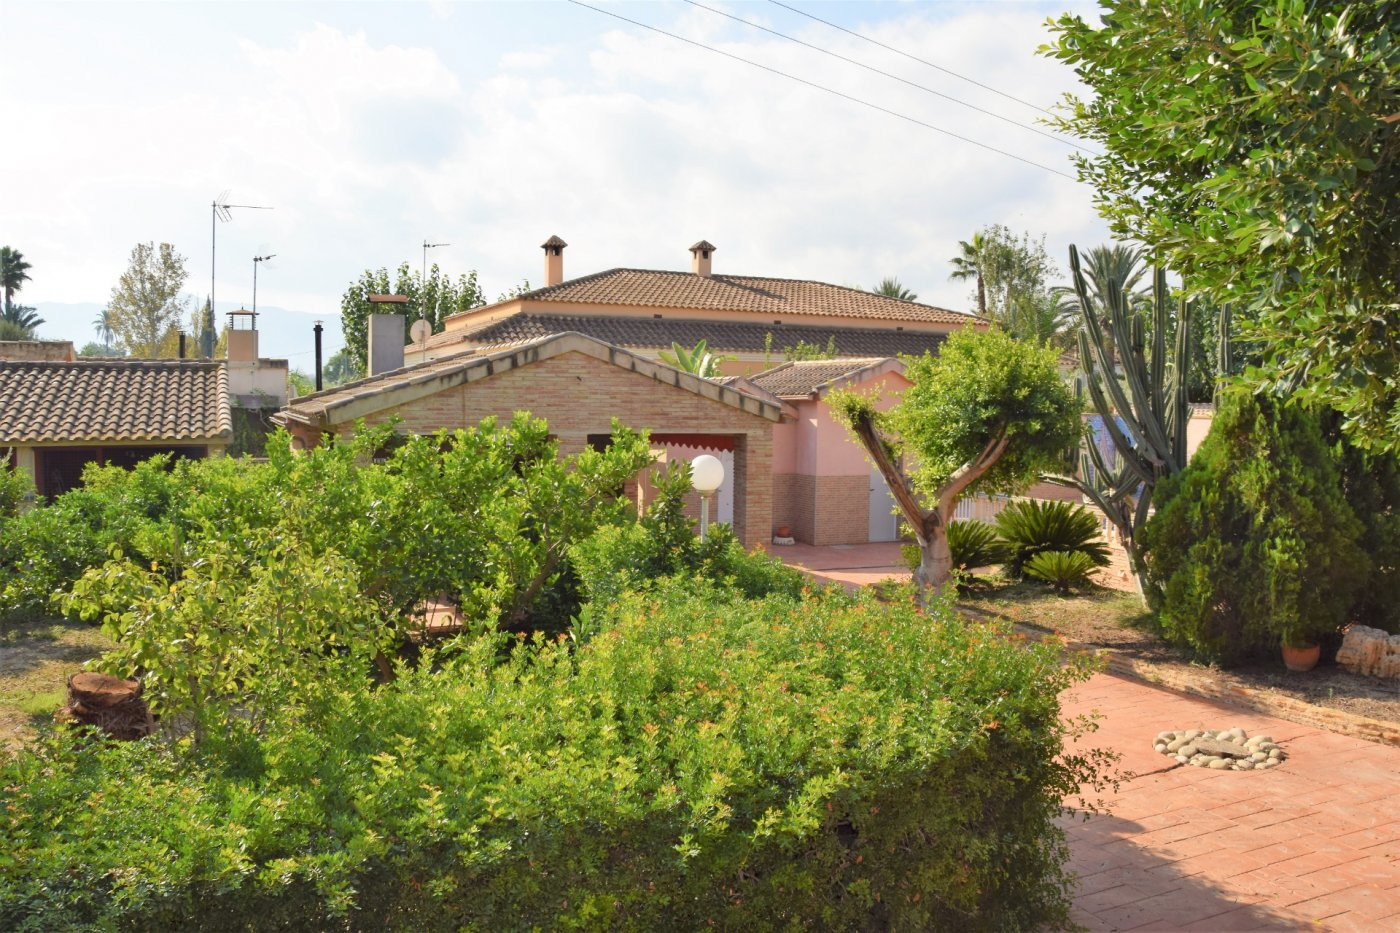 Chalet en Murcia www.joaquincarceles.com JC174 (2)